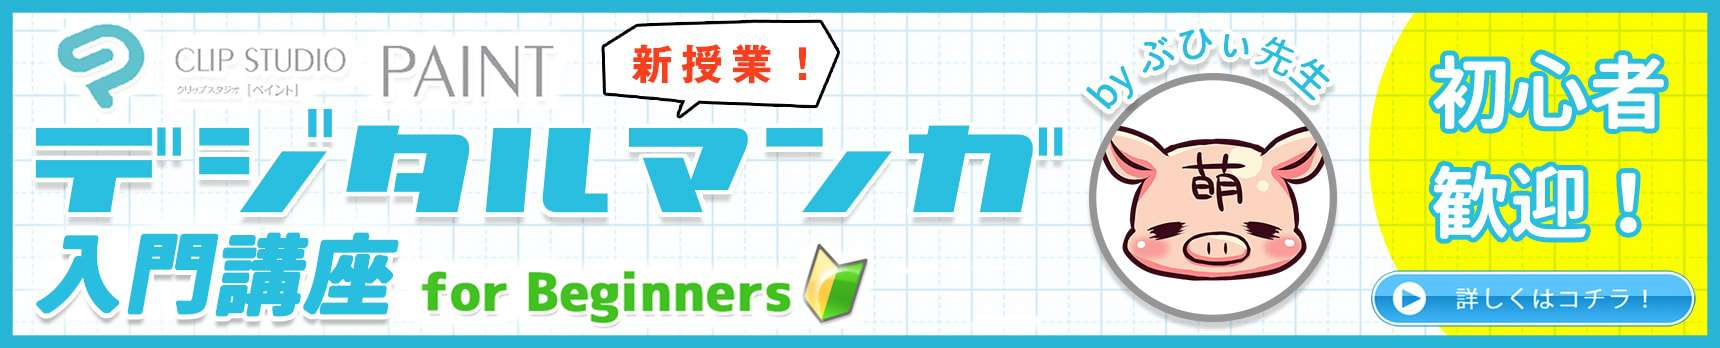 Buhi2 banner2 pc